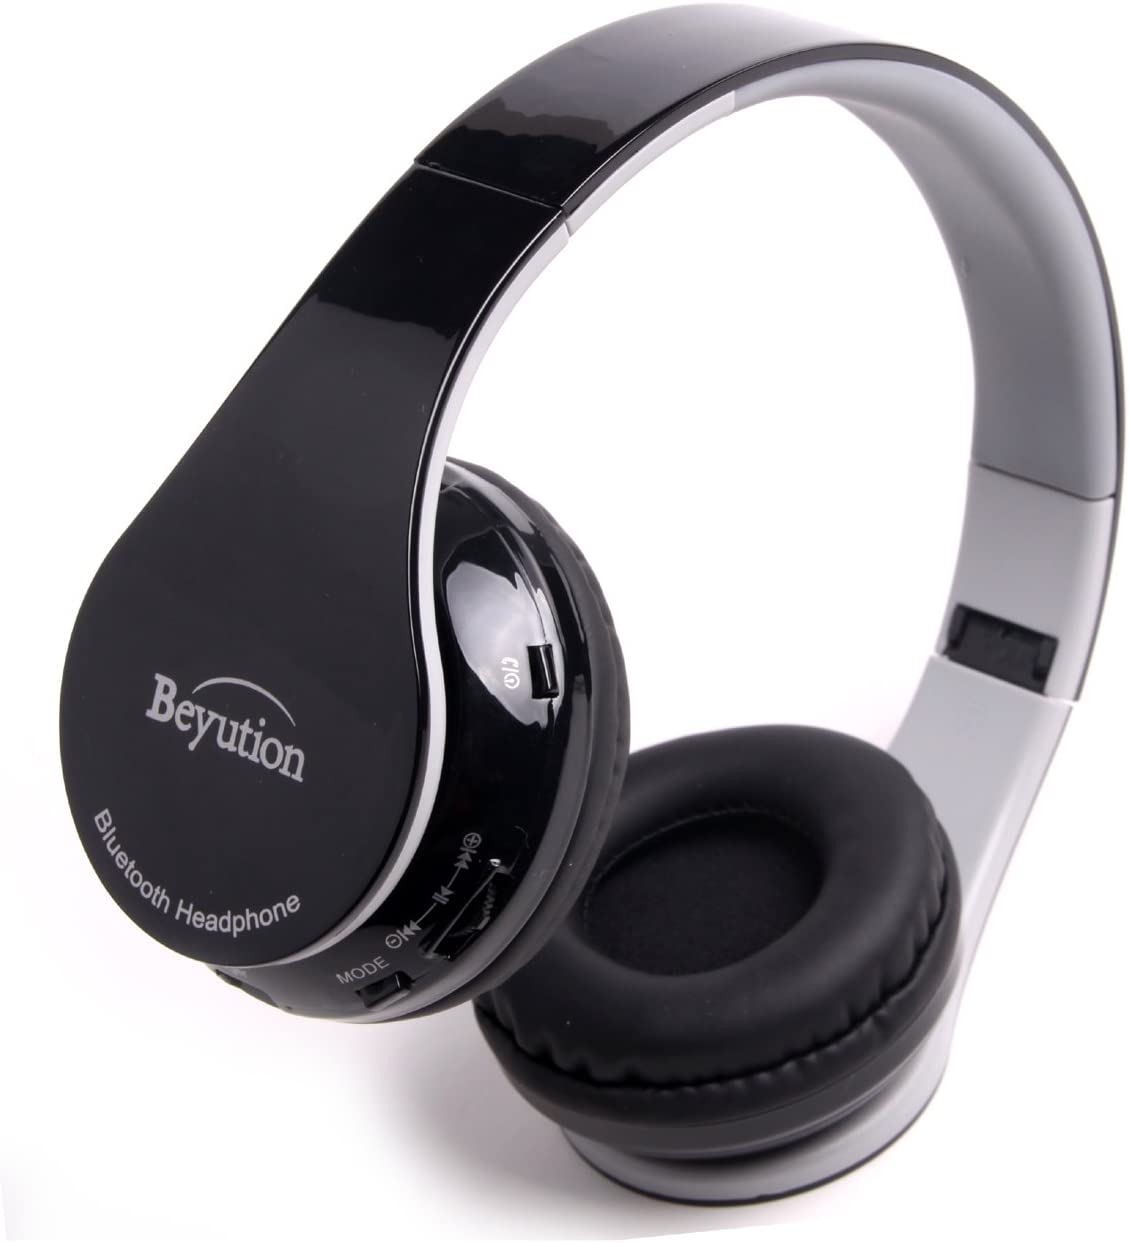 Beyution Smart Stereo Wireless Bluetooth Headphone---for Apple i